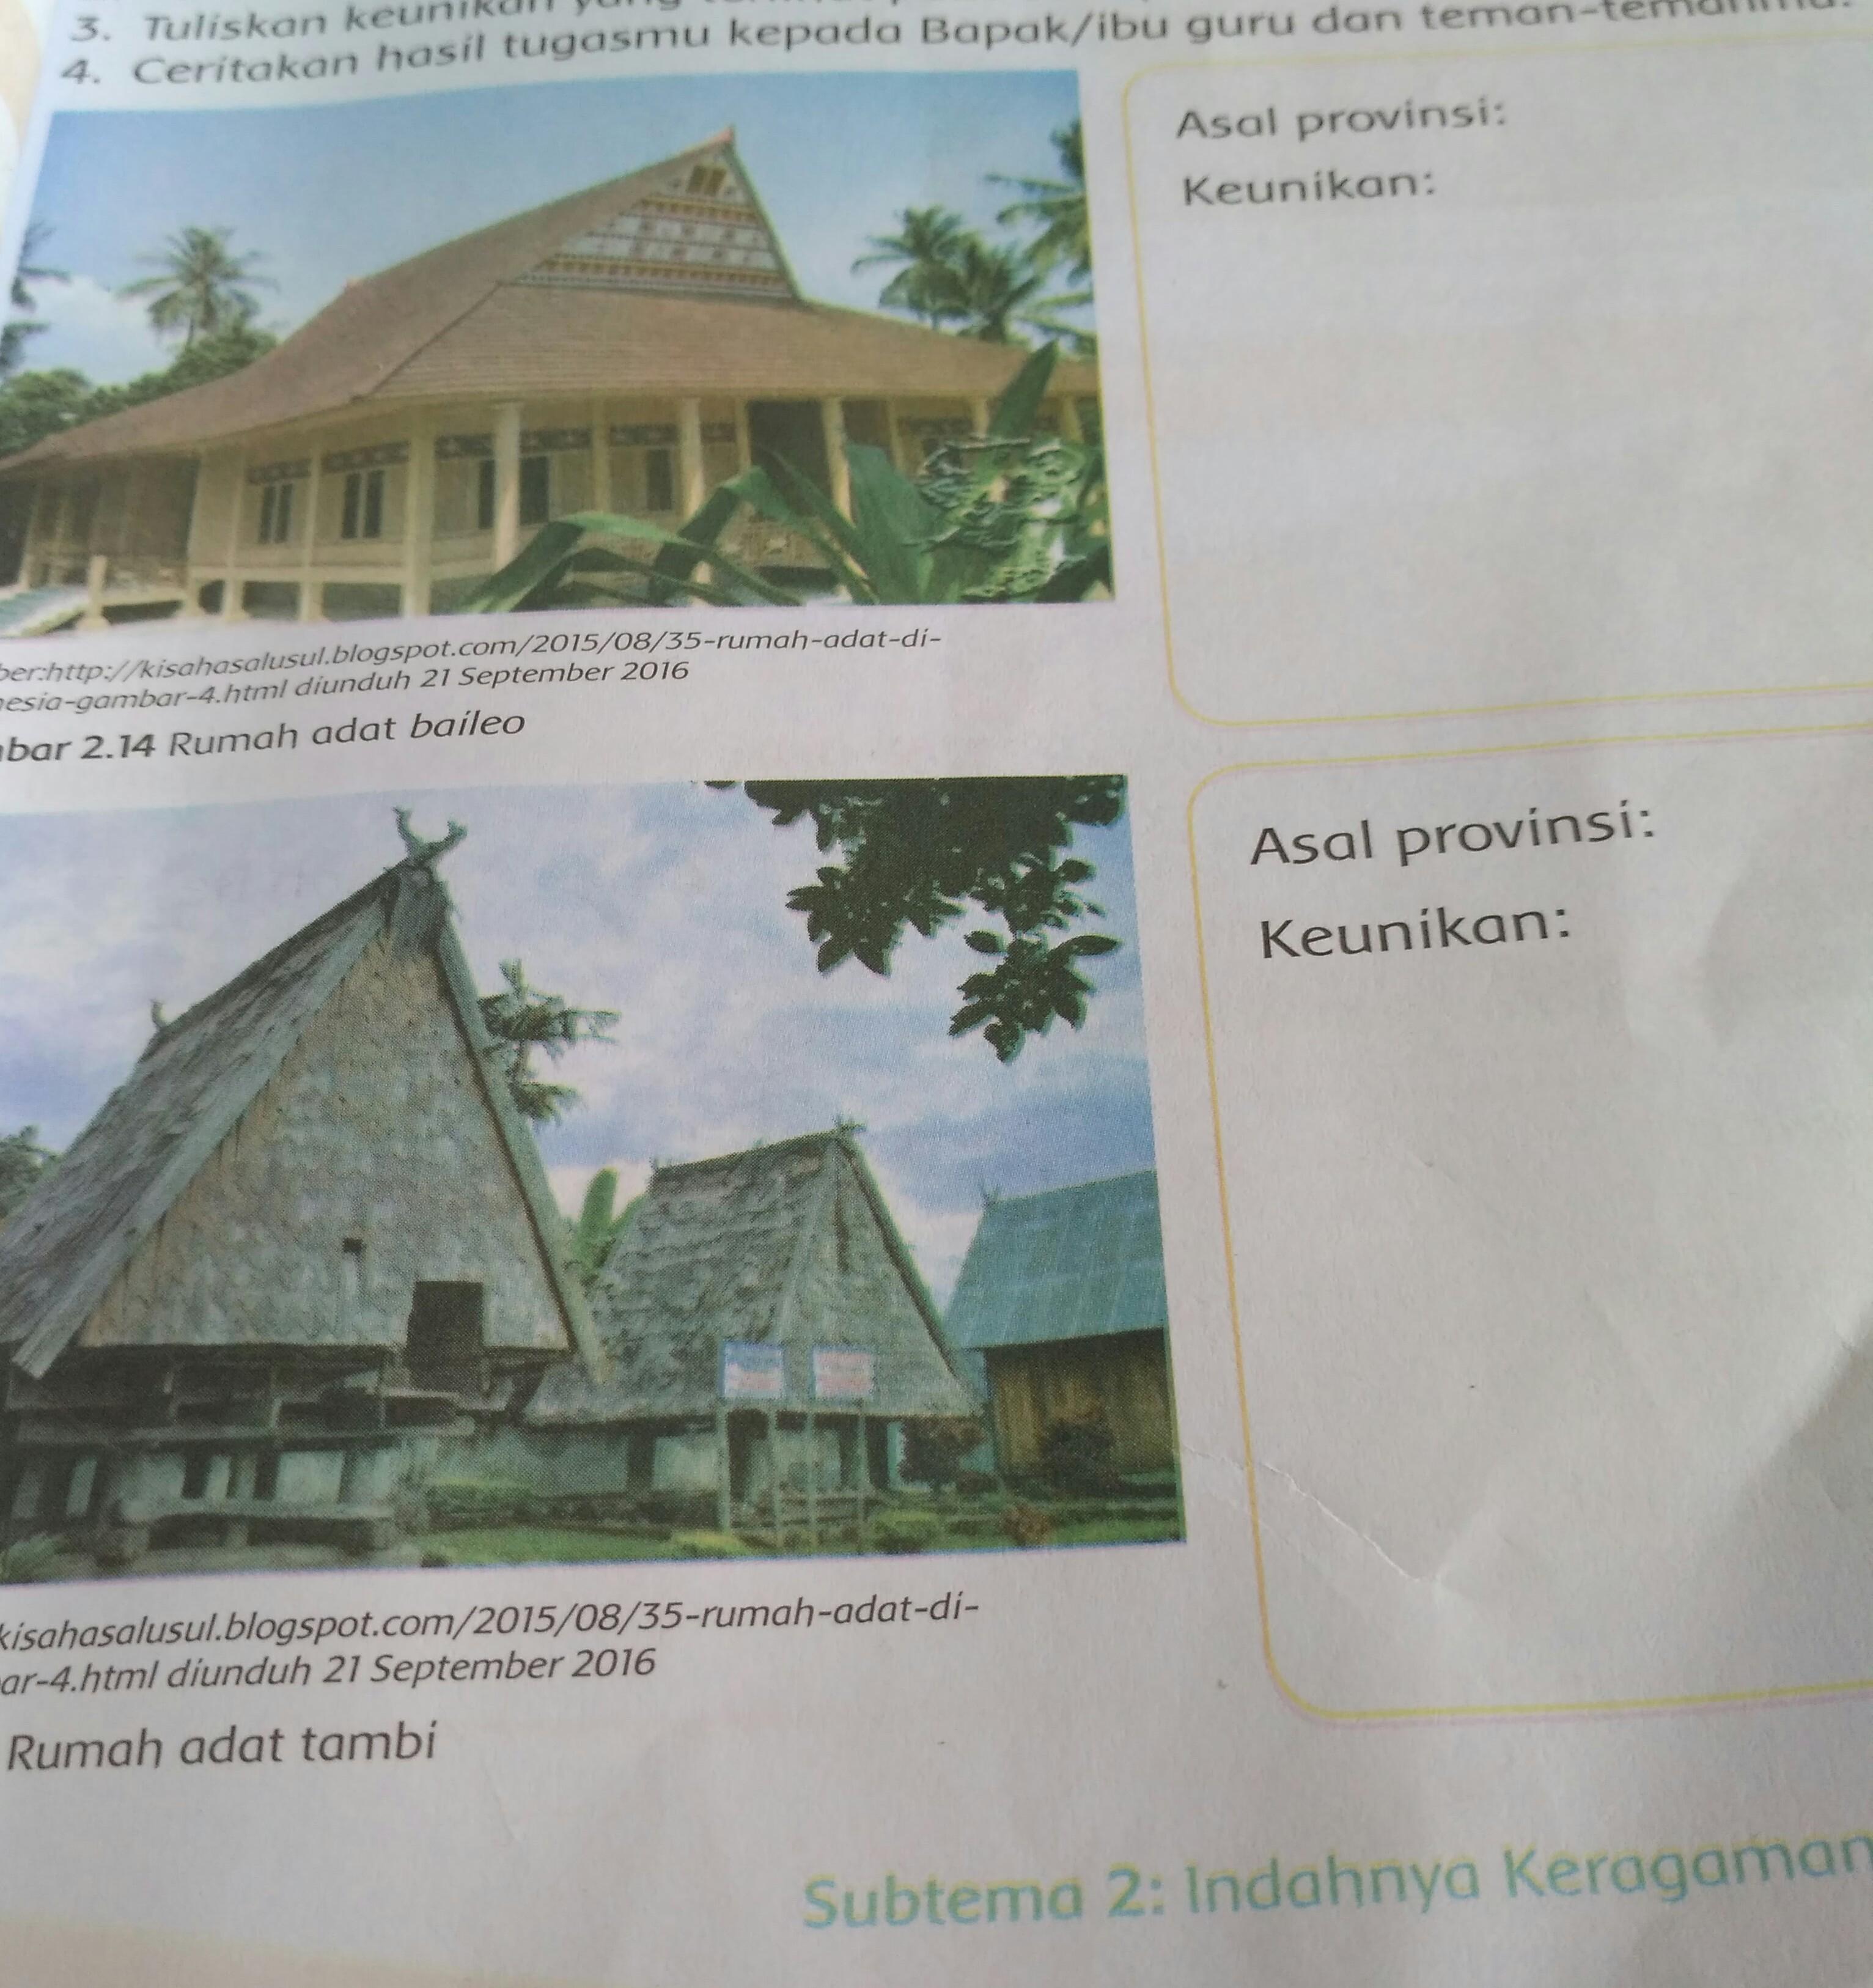 48 Gambar Rumah Adat Baileo Asal Provinsi Dan Keunikannya Terbaru Gambar Rumah